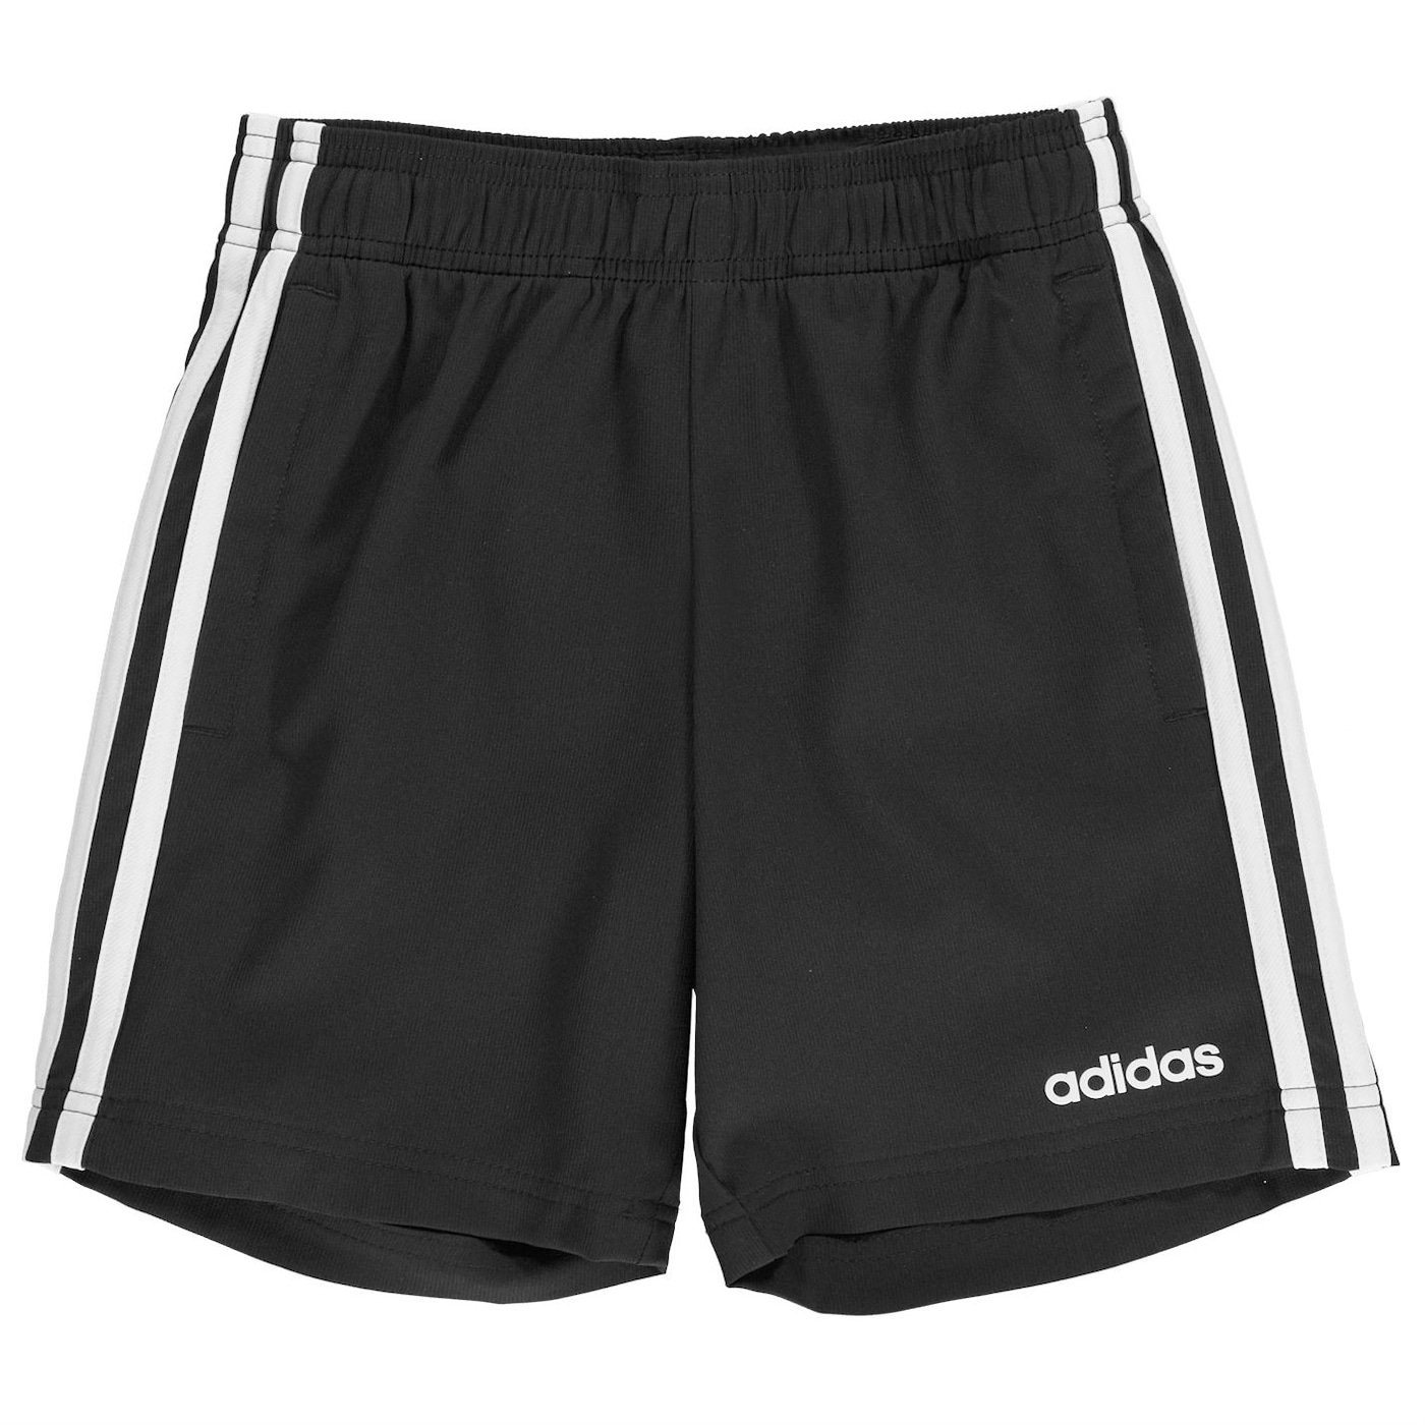 Adidas Junior Boys 3 Stripe Woven Shorts